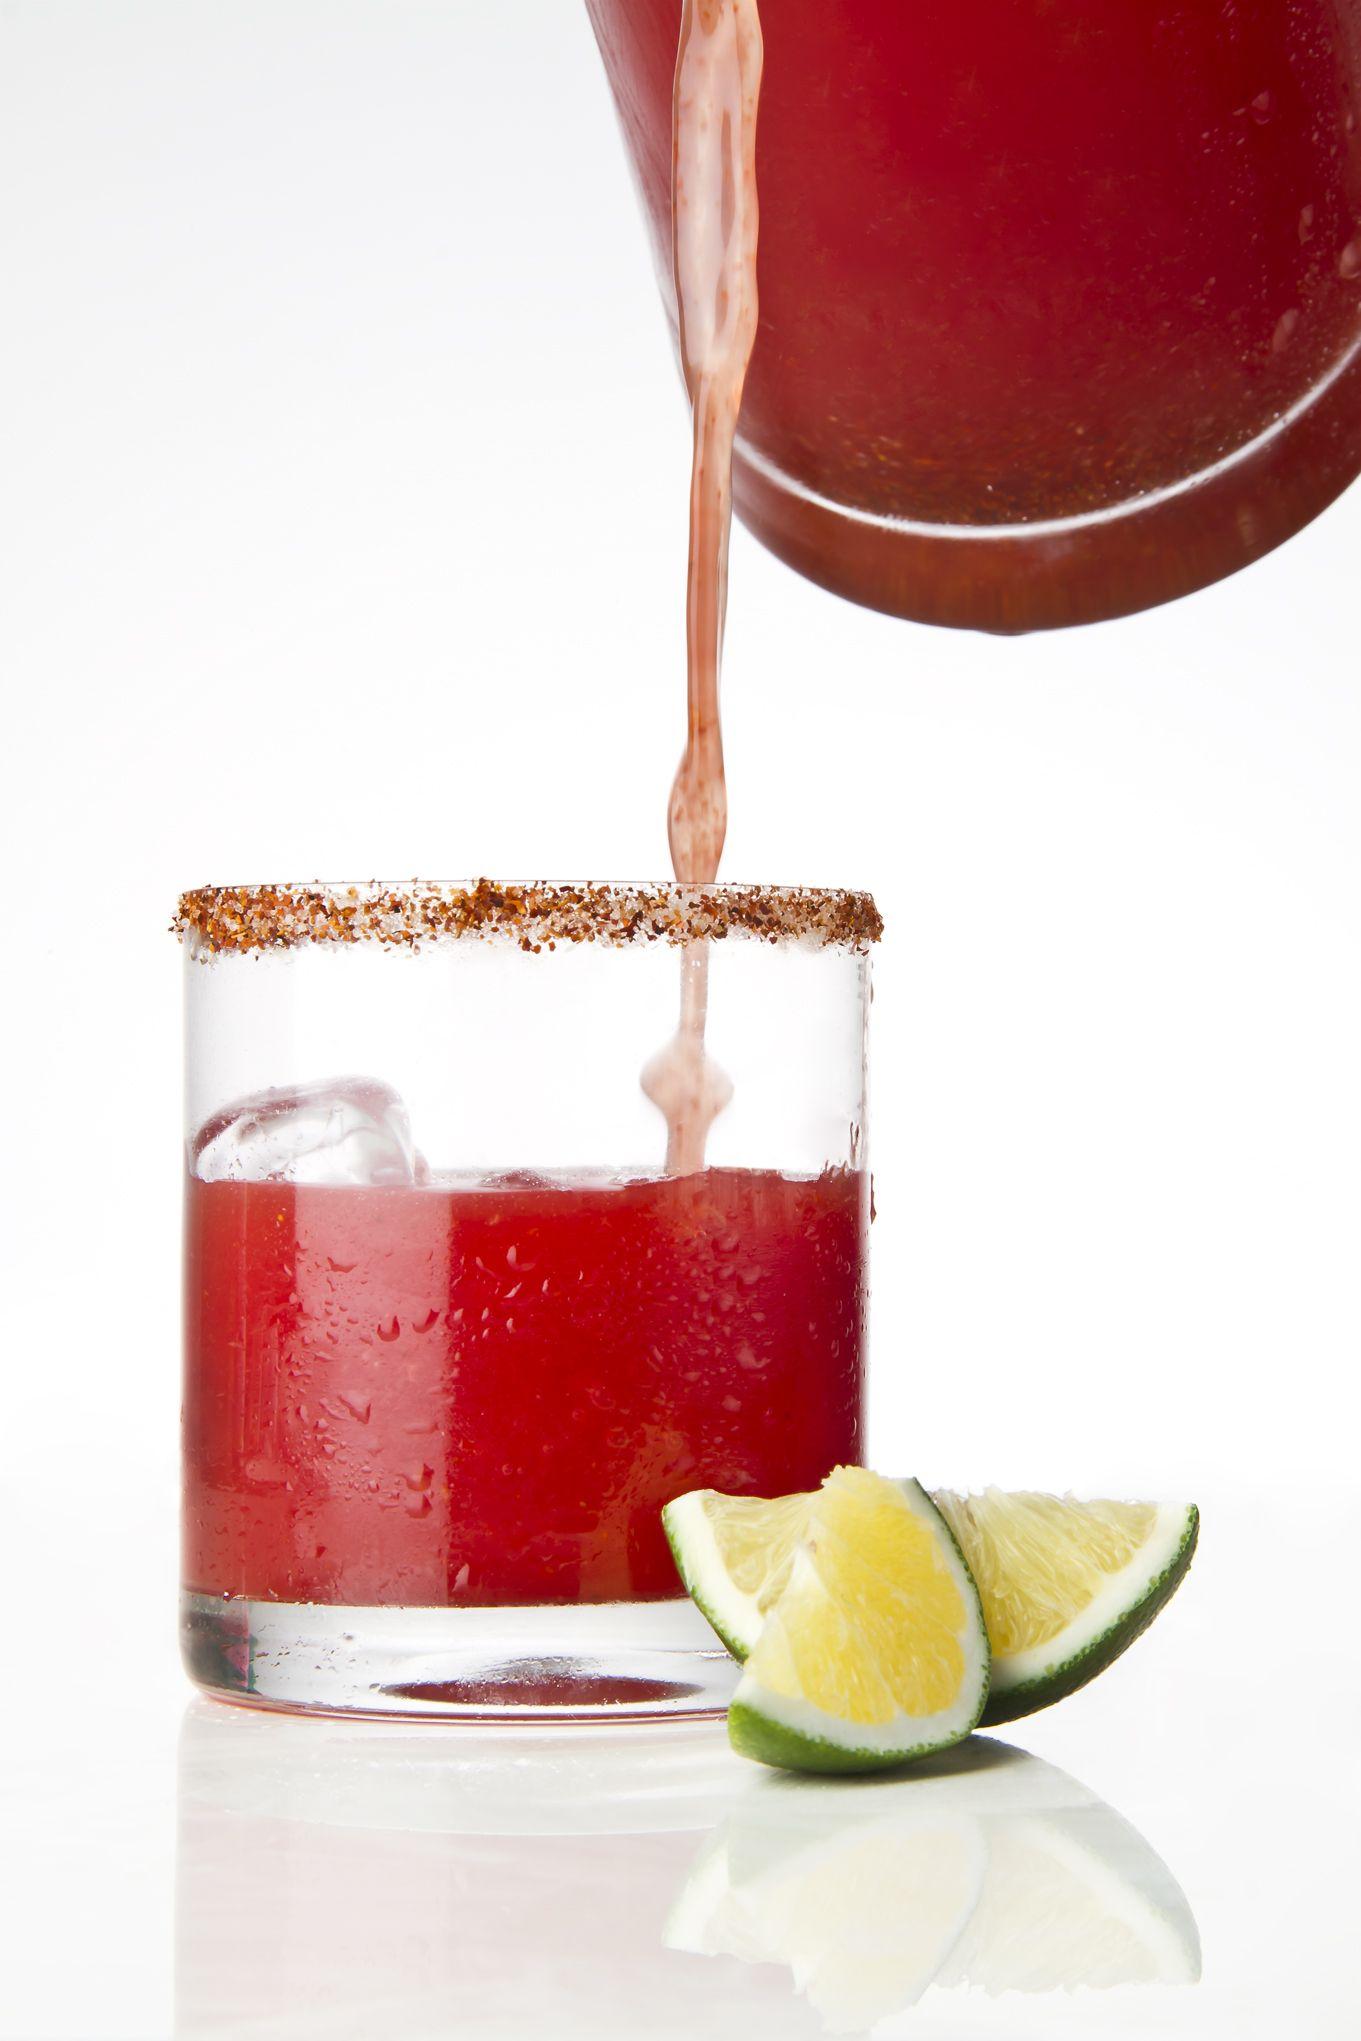 Agua De Sandia Y Chile Piquin Receta Agua De Sandia Recetas De Comida Mexicana Recetas De Comida